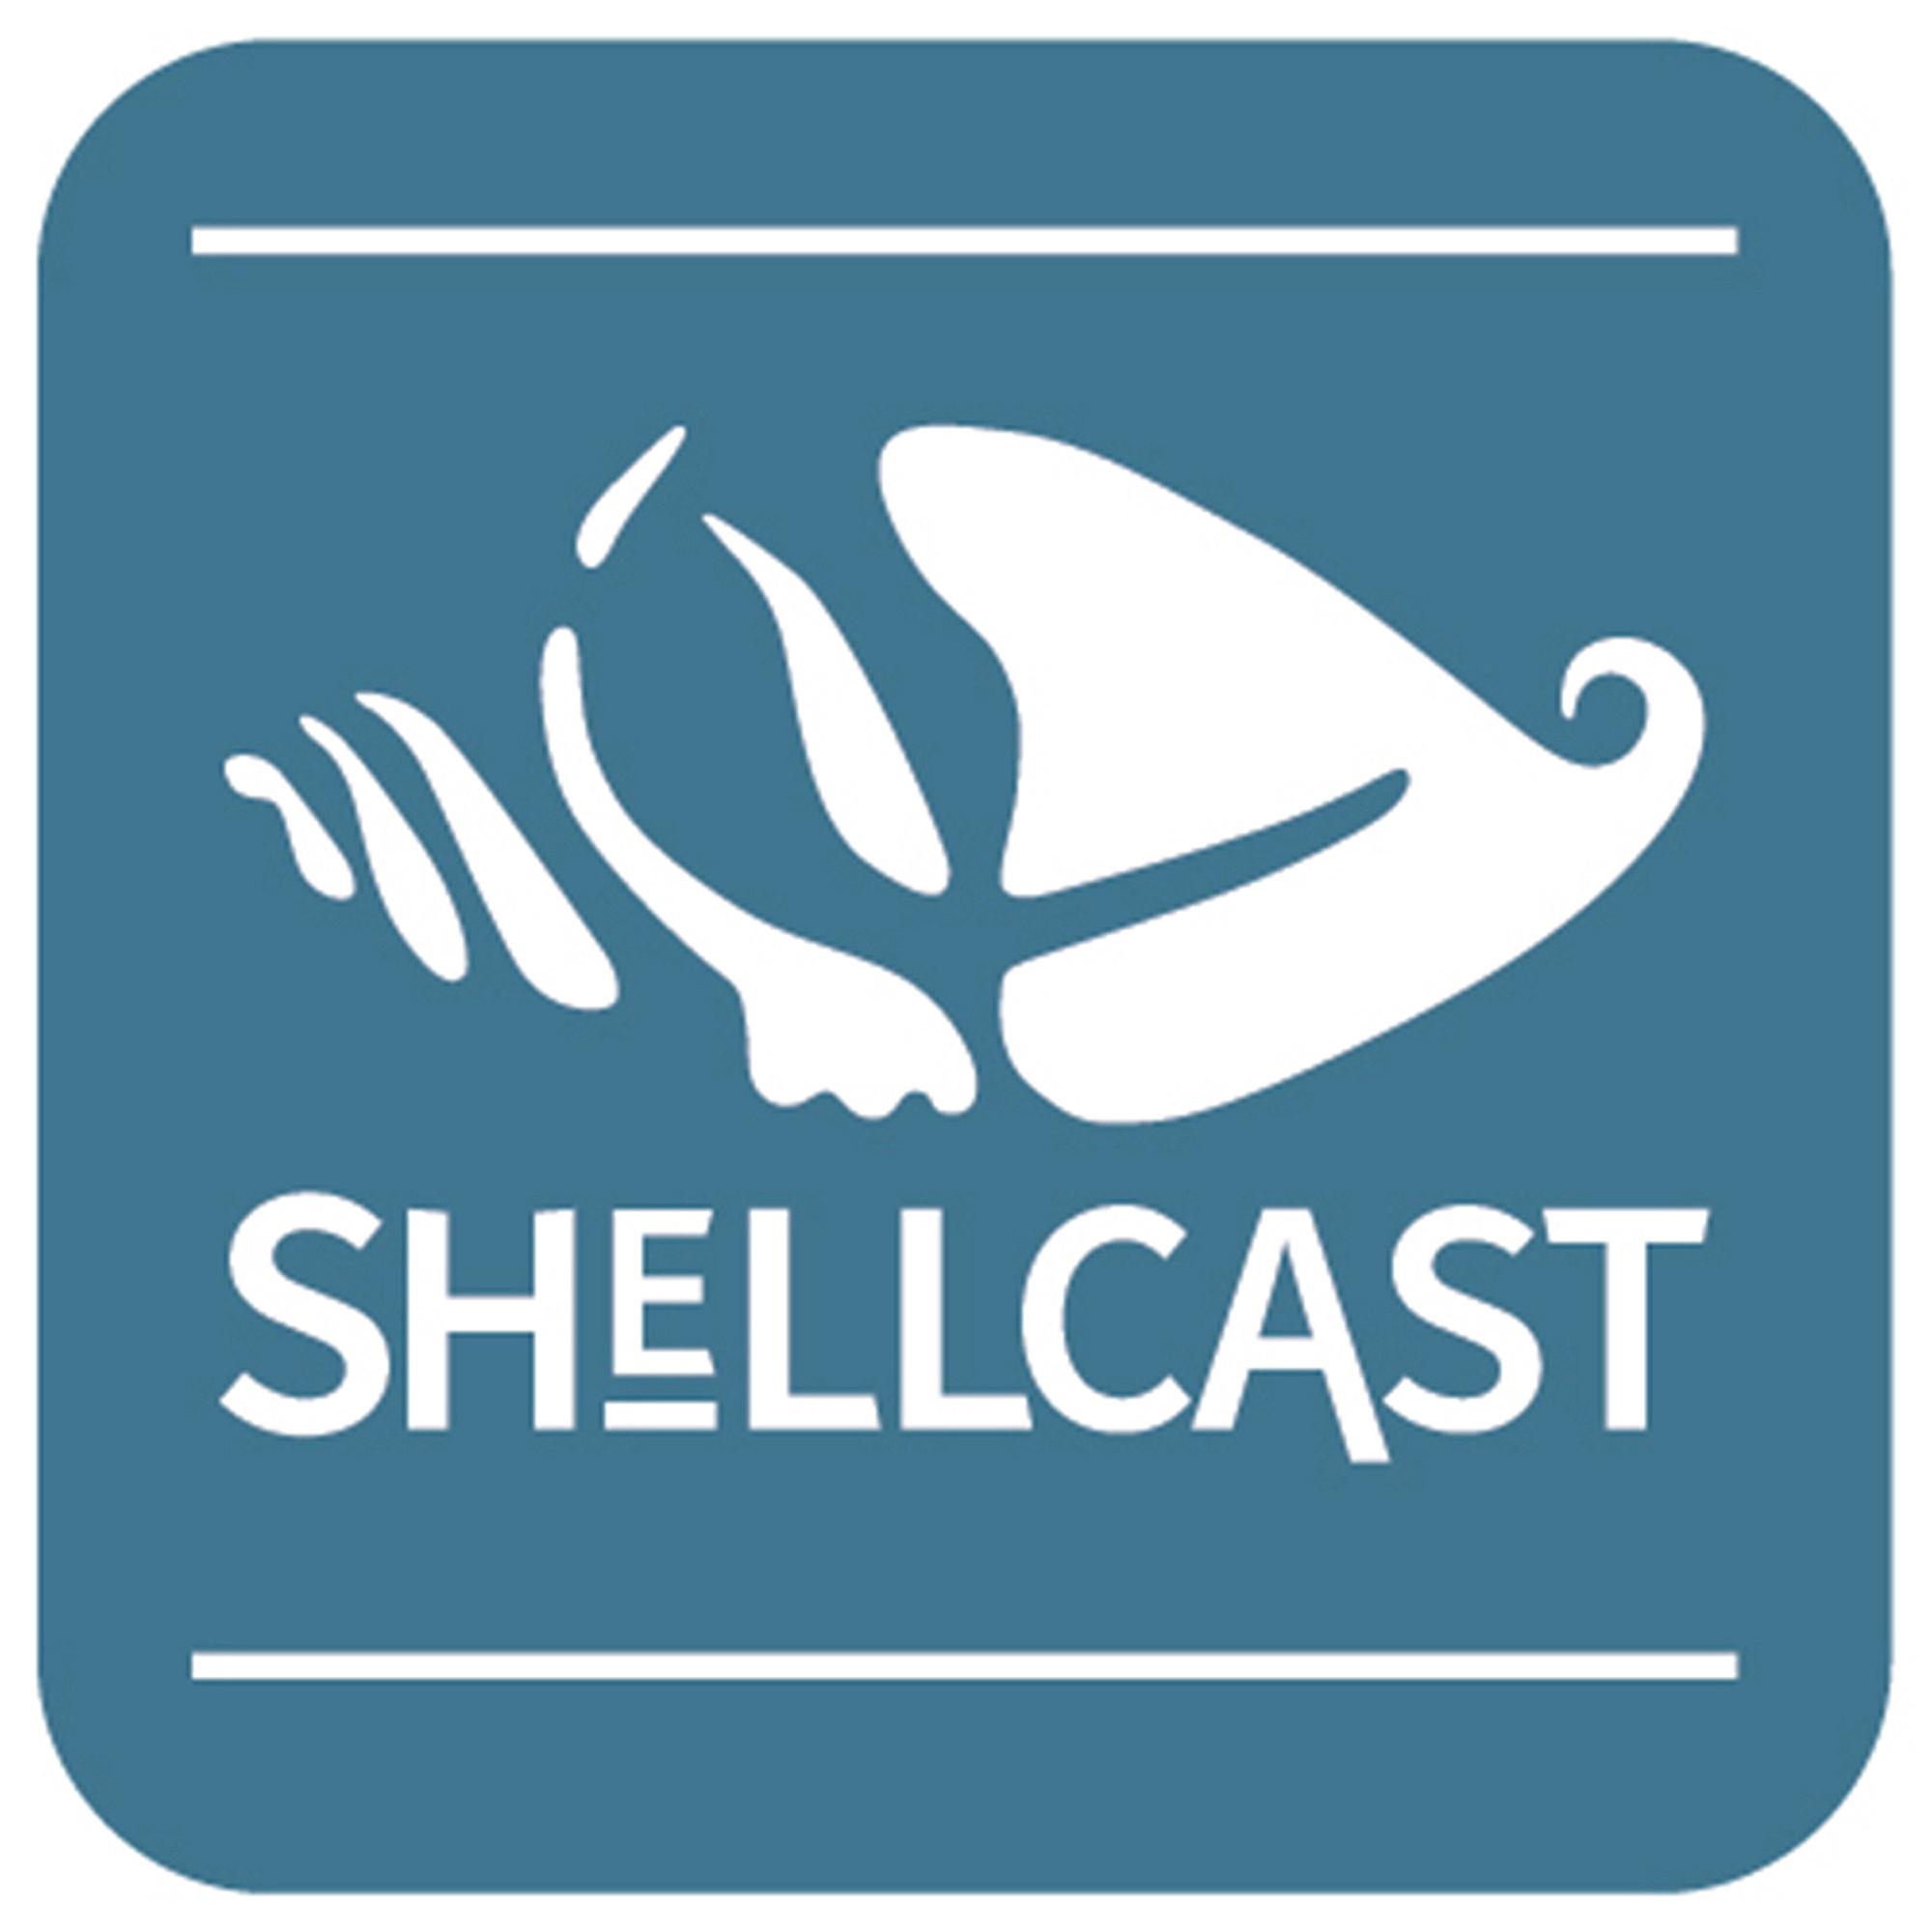 Shellcast